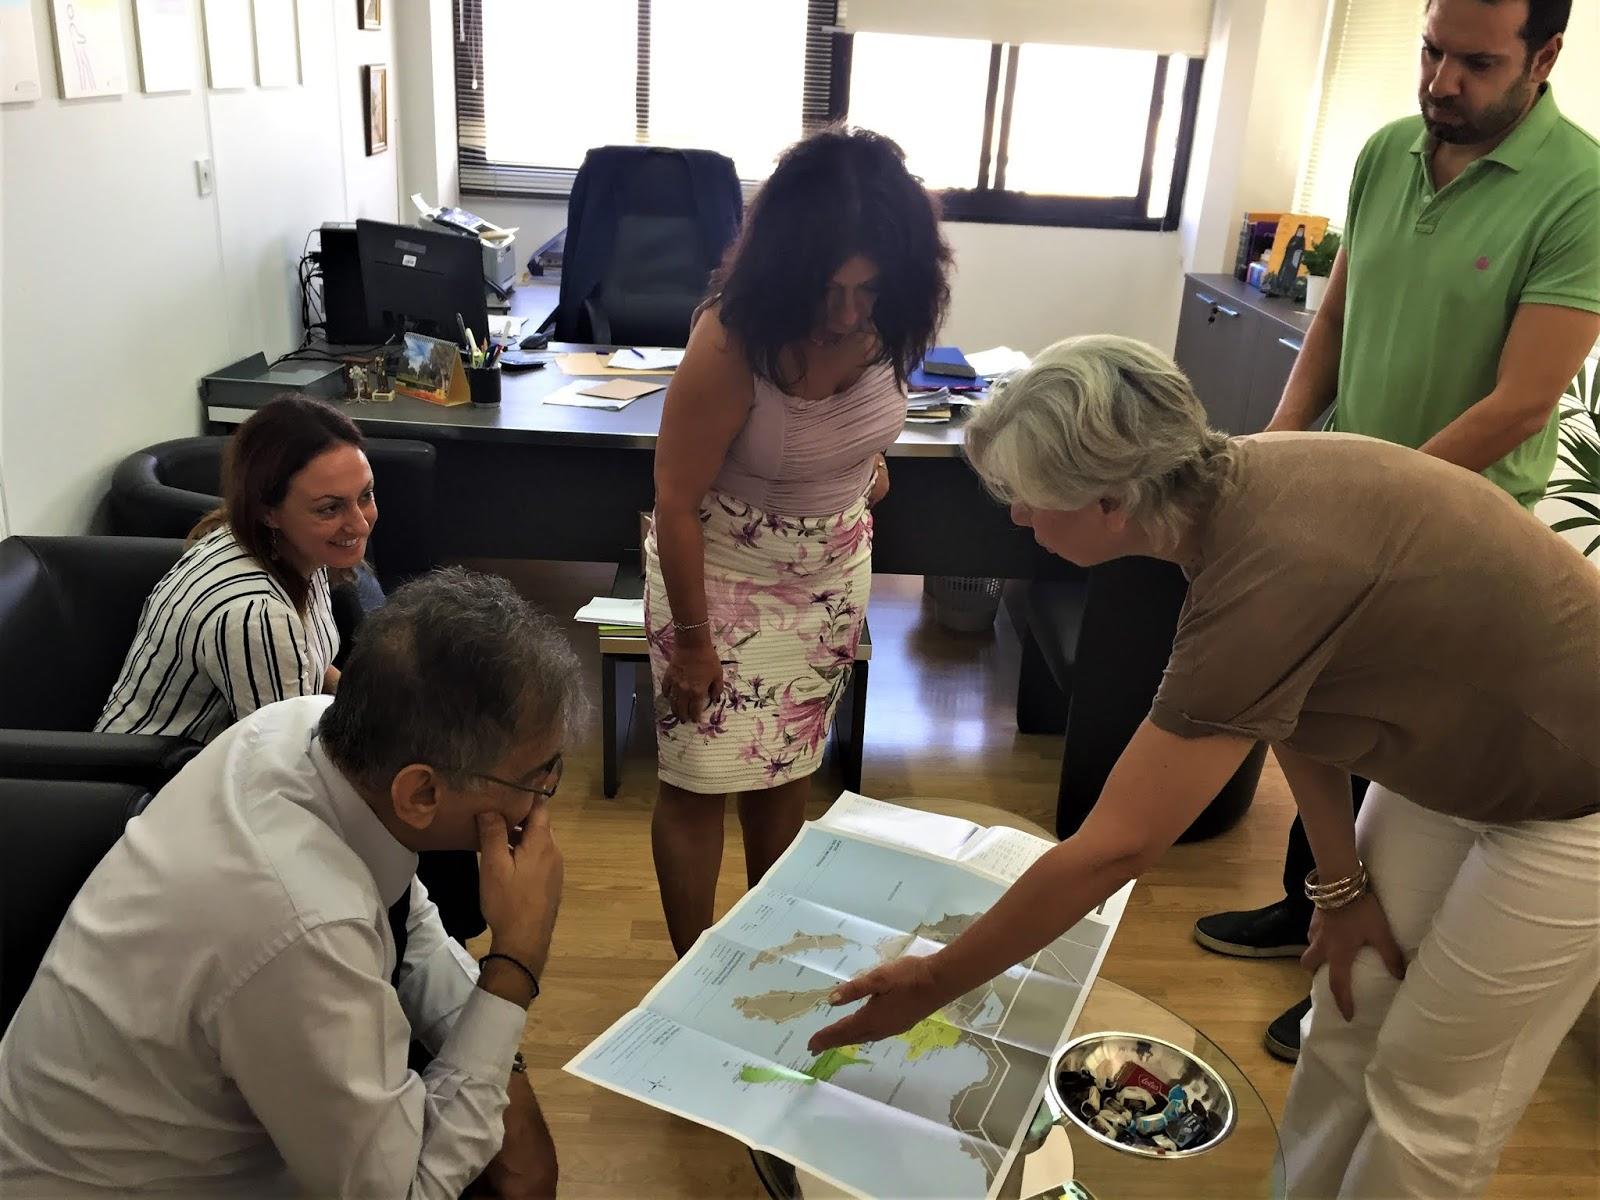 CaseStudy: πώς για μια γαστρονομική γιορτή μετέτρεψε την Ανατολική Χαλκιδική σε πολυμορφικό προορισμό διακοπών